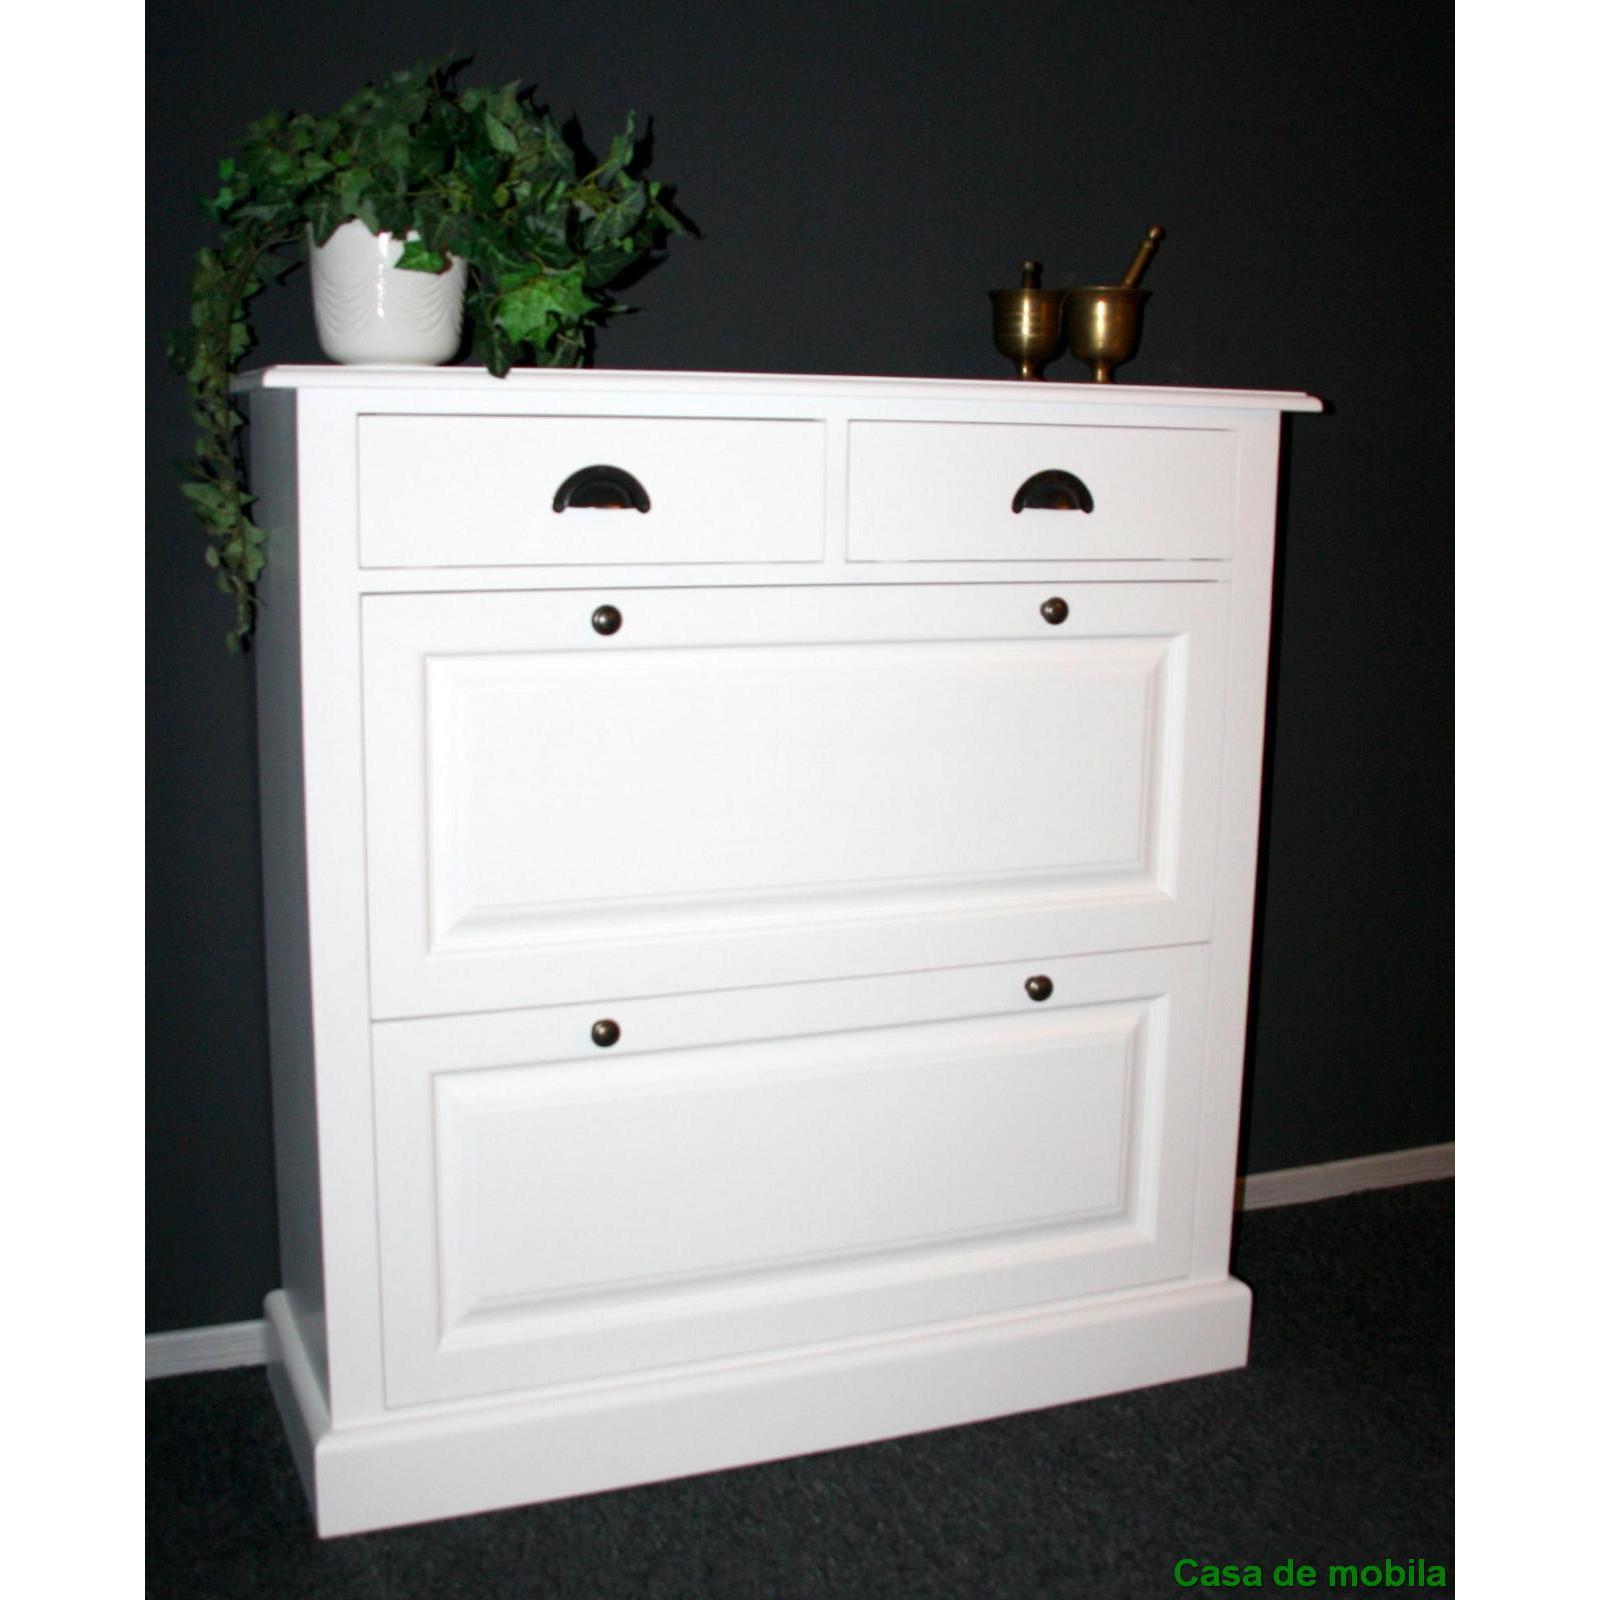 massivholz schuhschrank schuhkommode fichte massiv wei. Black Bedroom Furniture Sets. Home Design Ideas